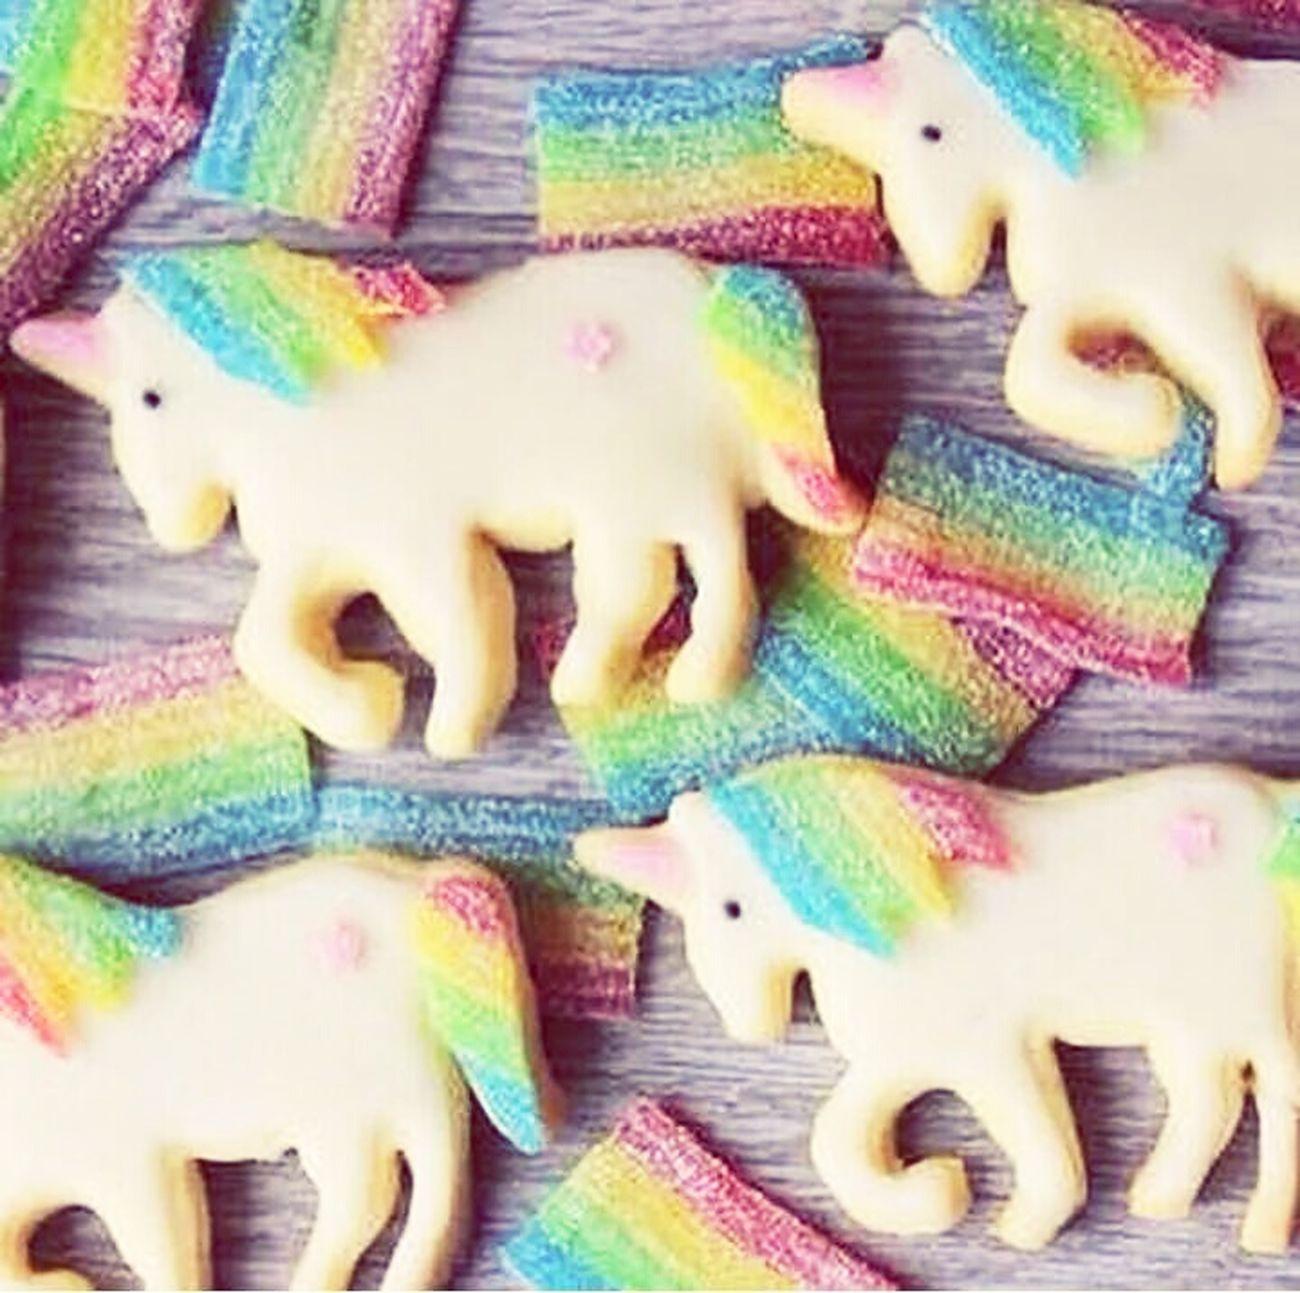 Food Comida Unicorn Unicornio Colores